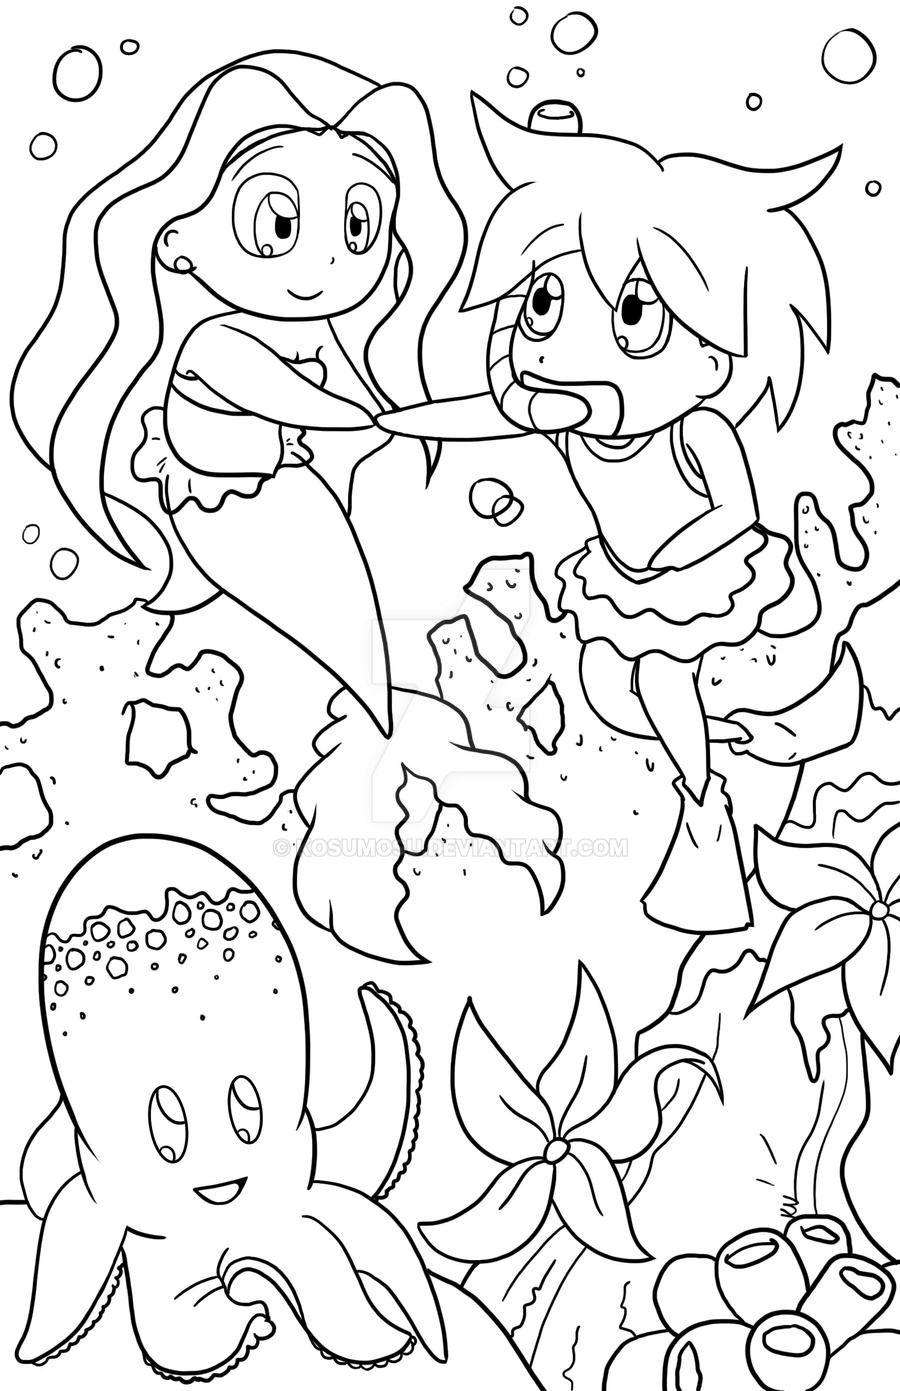 random coloring pages random doodle coloring page free printable coloring pages coloring pages random